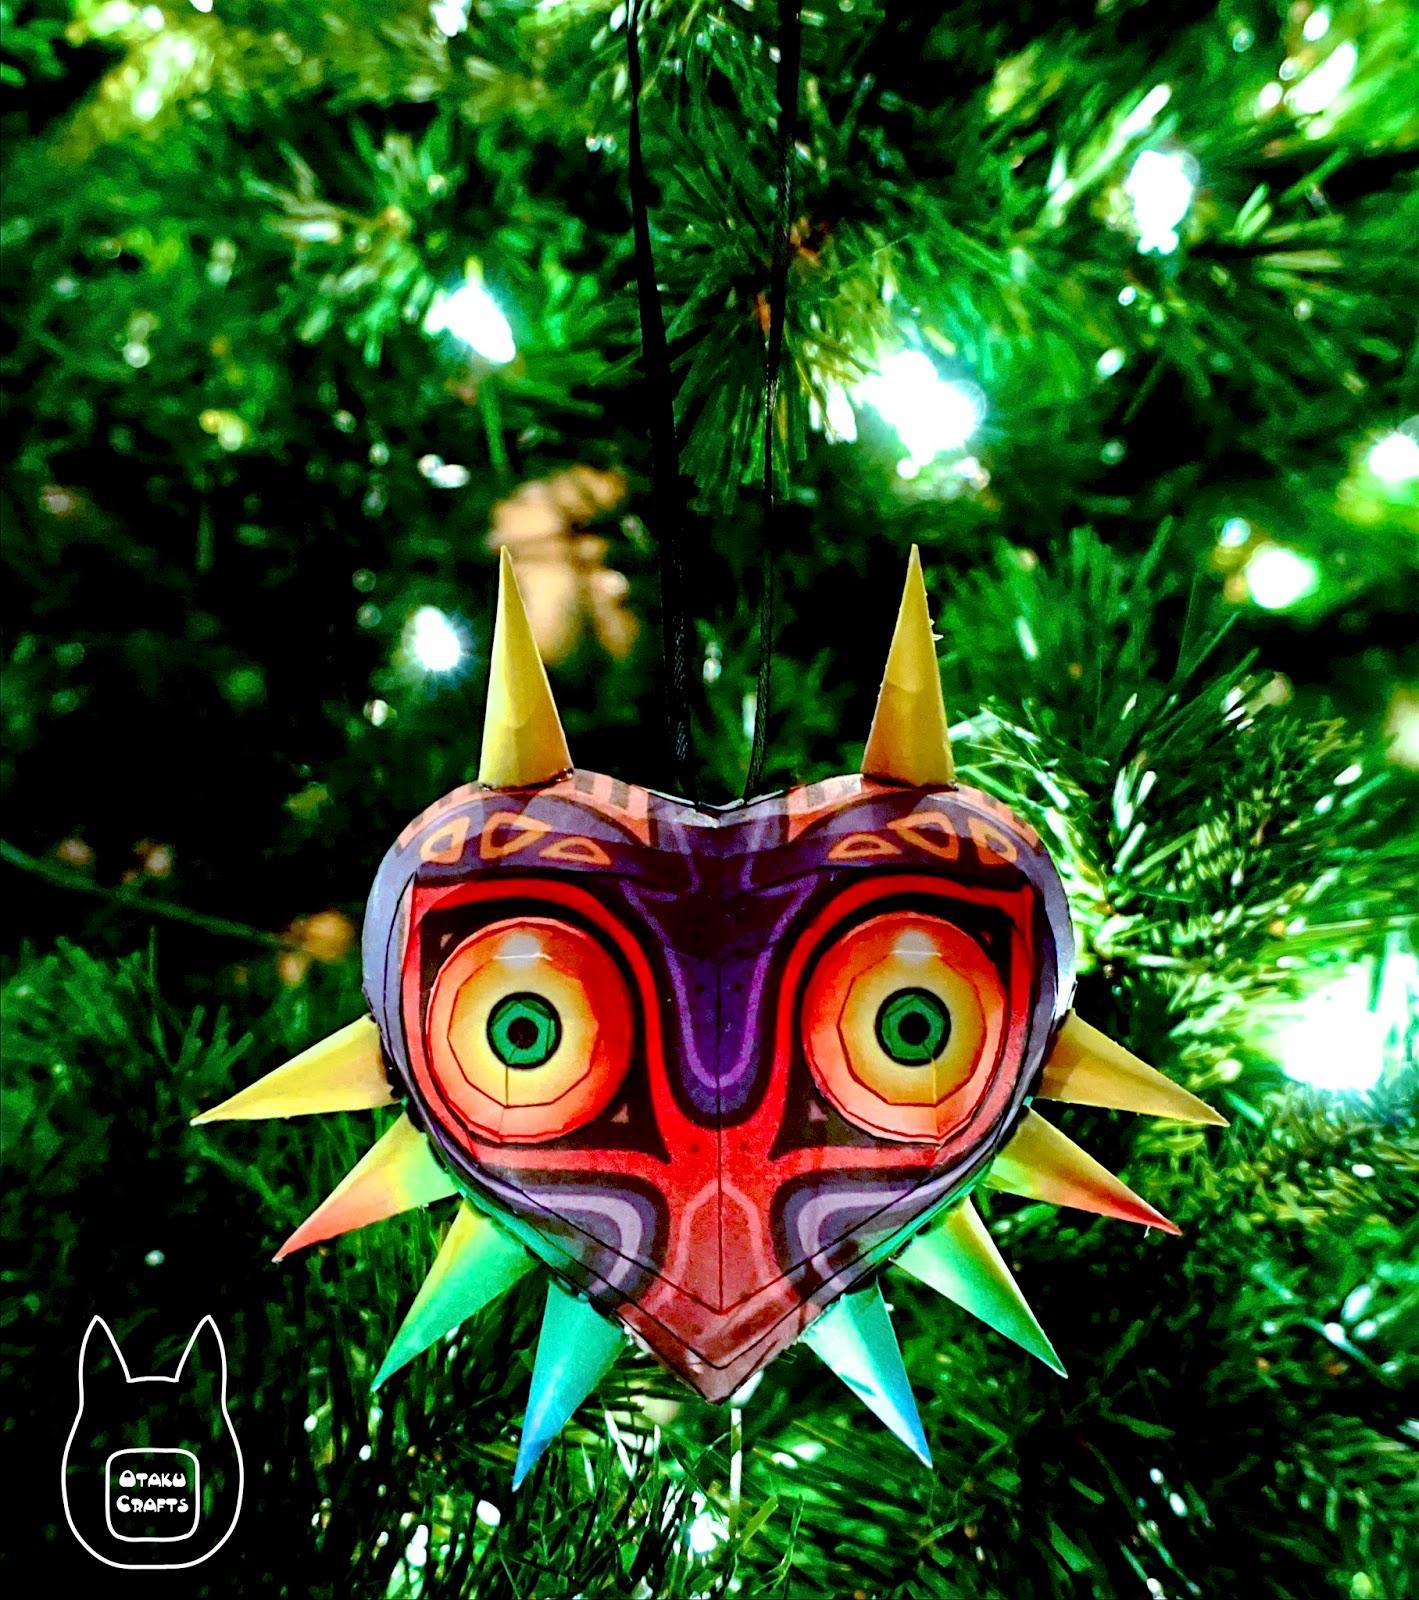 Otaku Crafts: Majora\'s Mask Papercraft Ornament